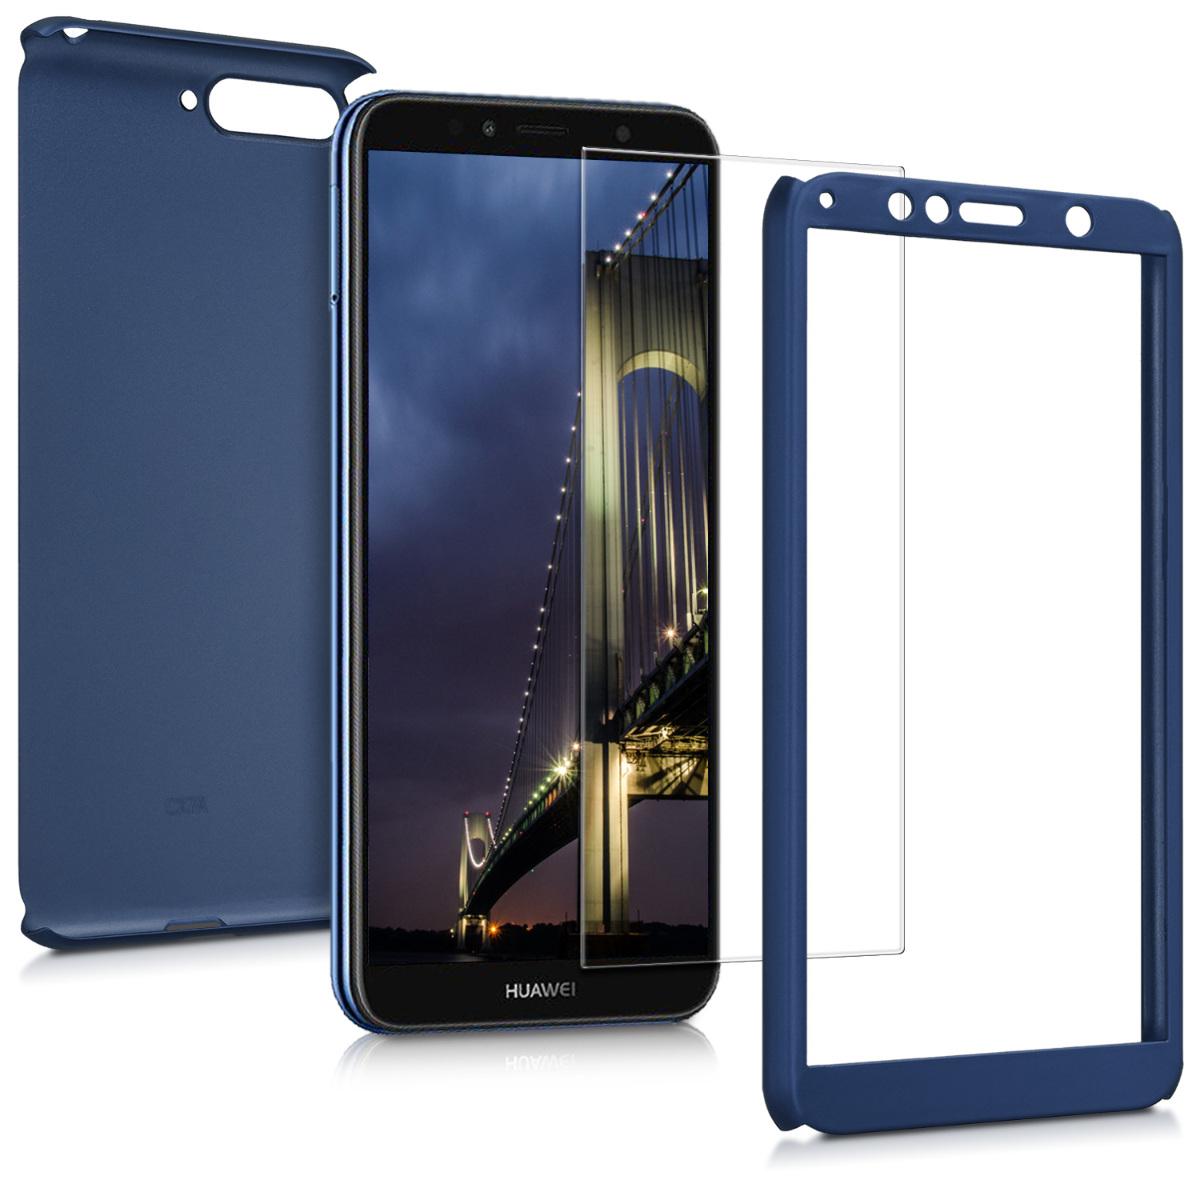 KW Θήκη Full Body Huawei Y6 2018 & Tempered Glass - Μπλε μεταλλικό (45639.64)